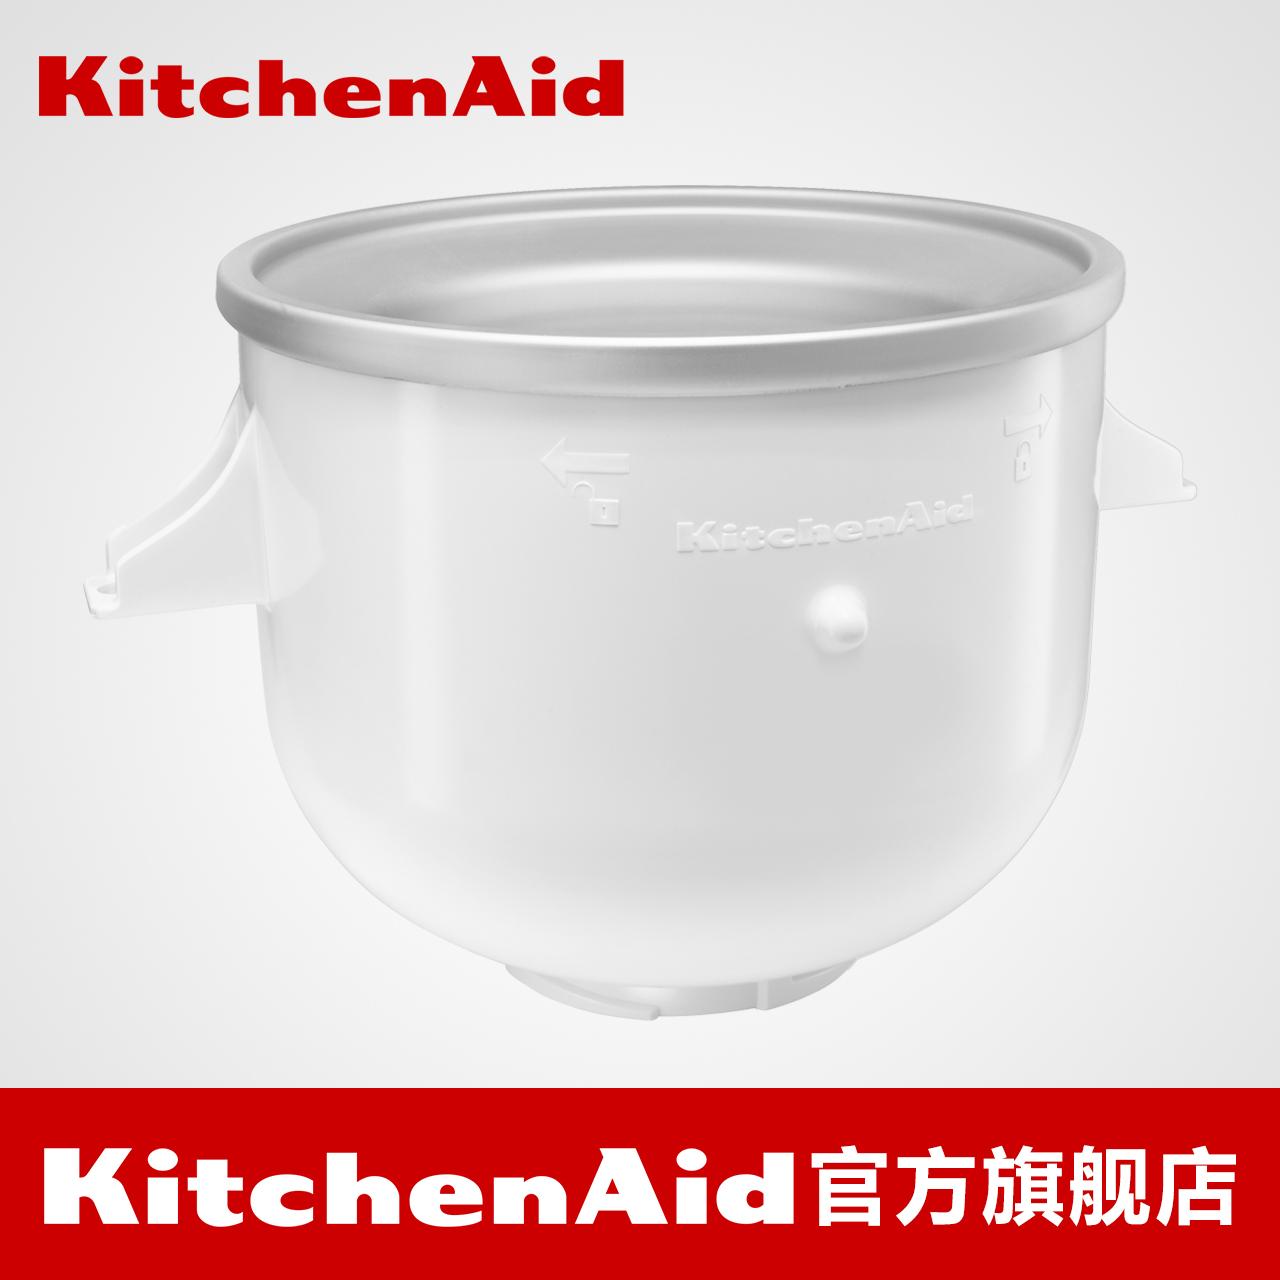 KitchenAid 5KICAOWH 冰淇淋雪糕机冰激凌厨师机通用配件220V